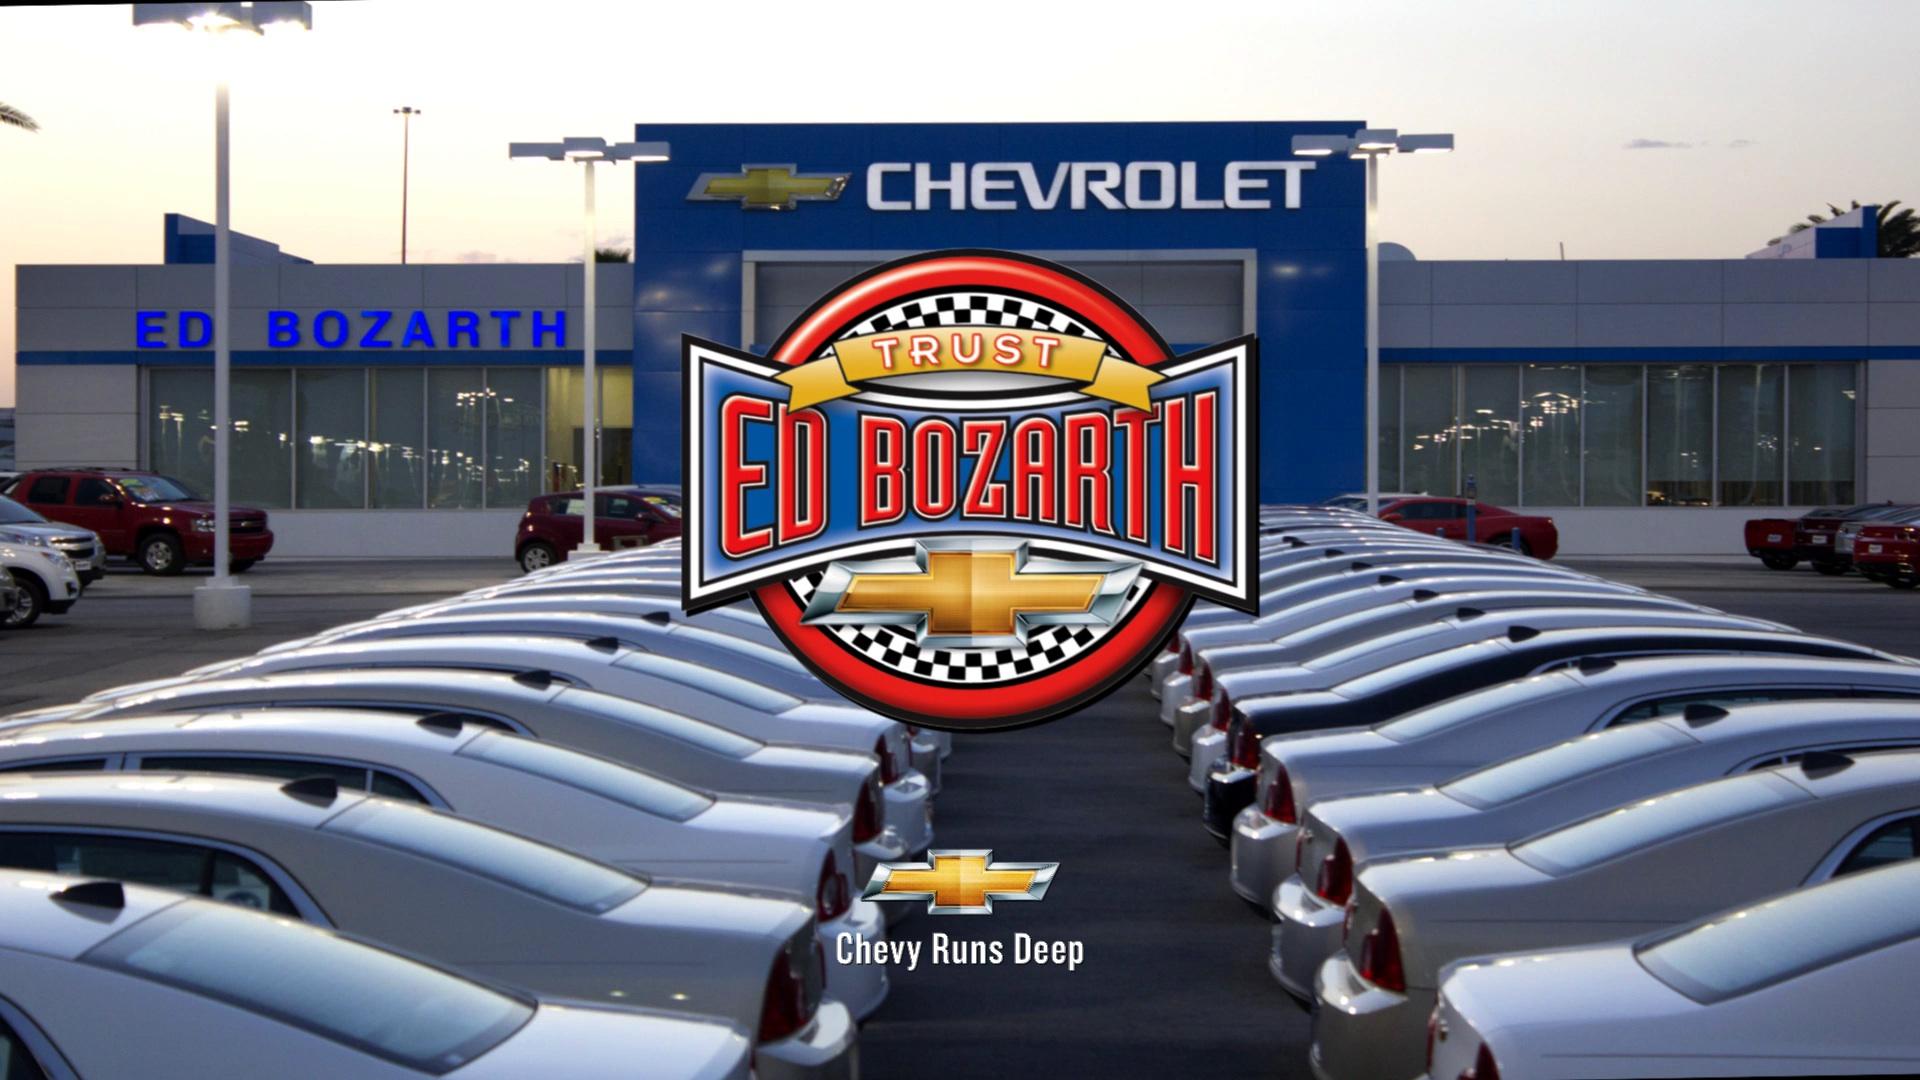 Ed Bozarth Chevrolet | Las Vegas Sun News